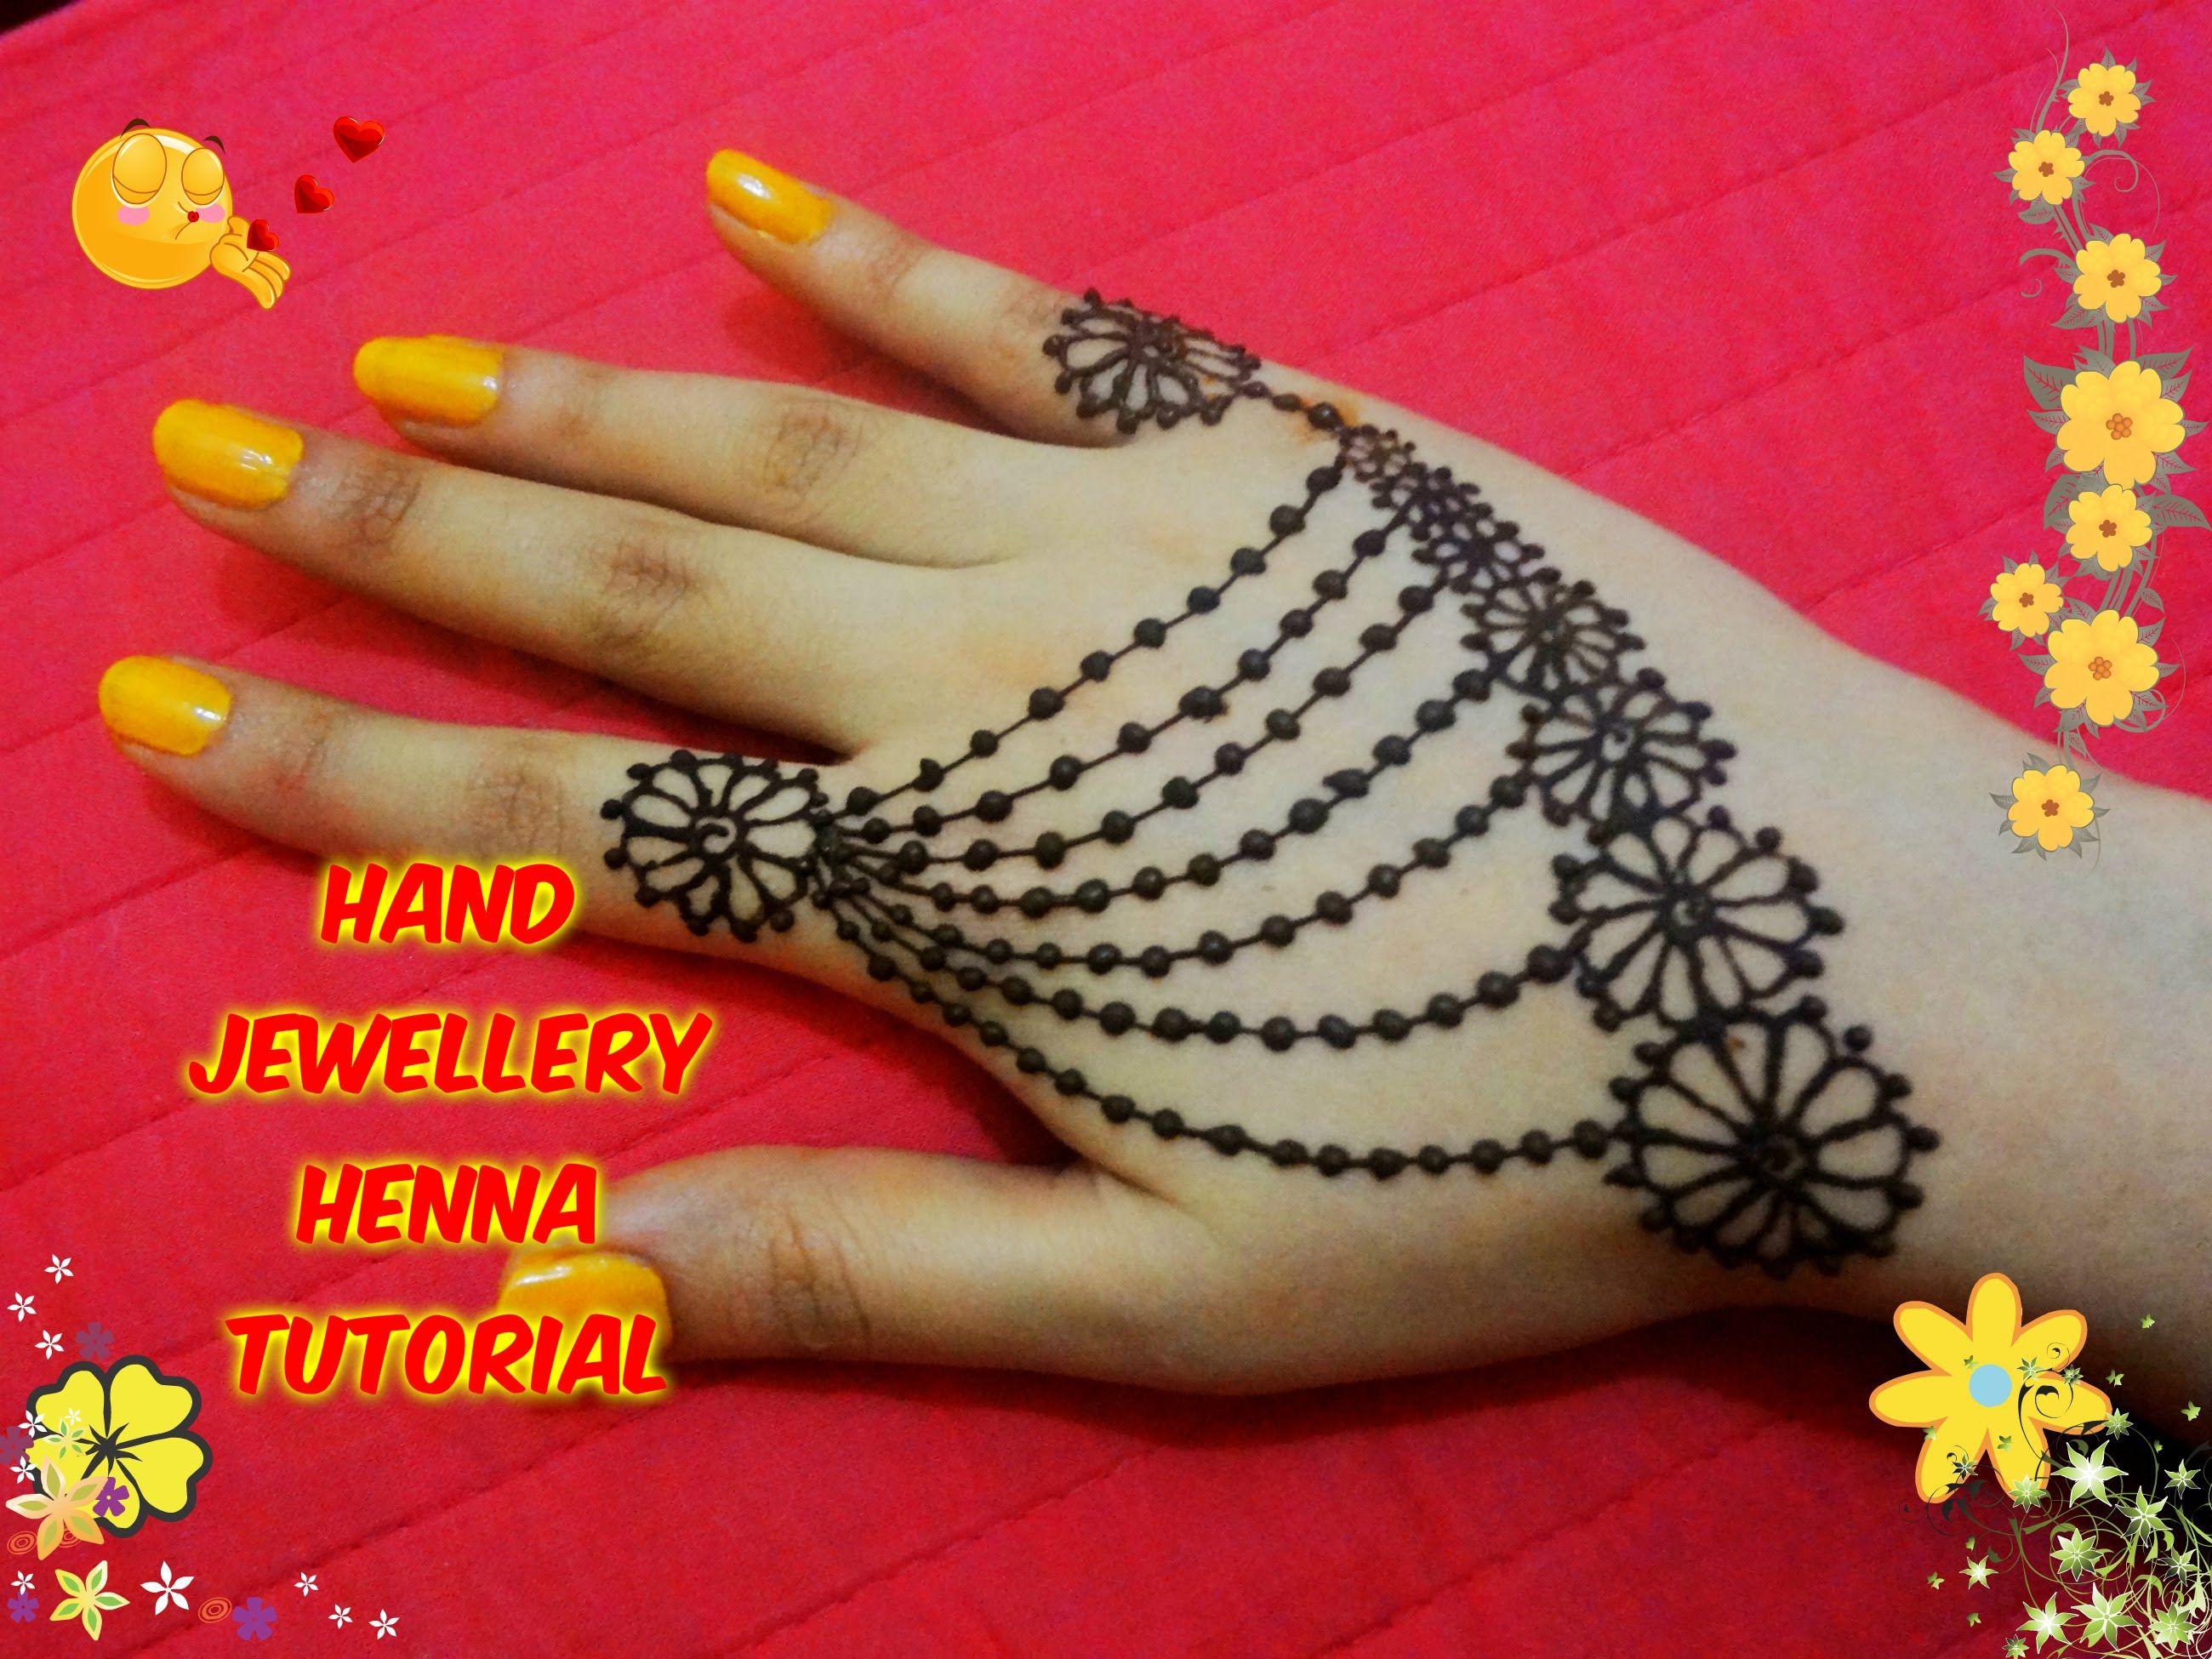 Simple Diy Mehndi Designs : Easy diy best and beautiful hand jewellery henna mehndi